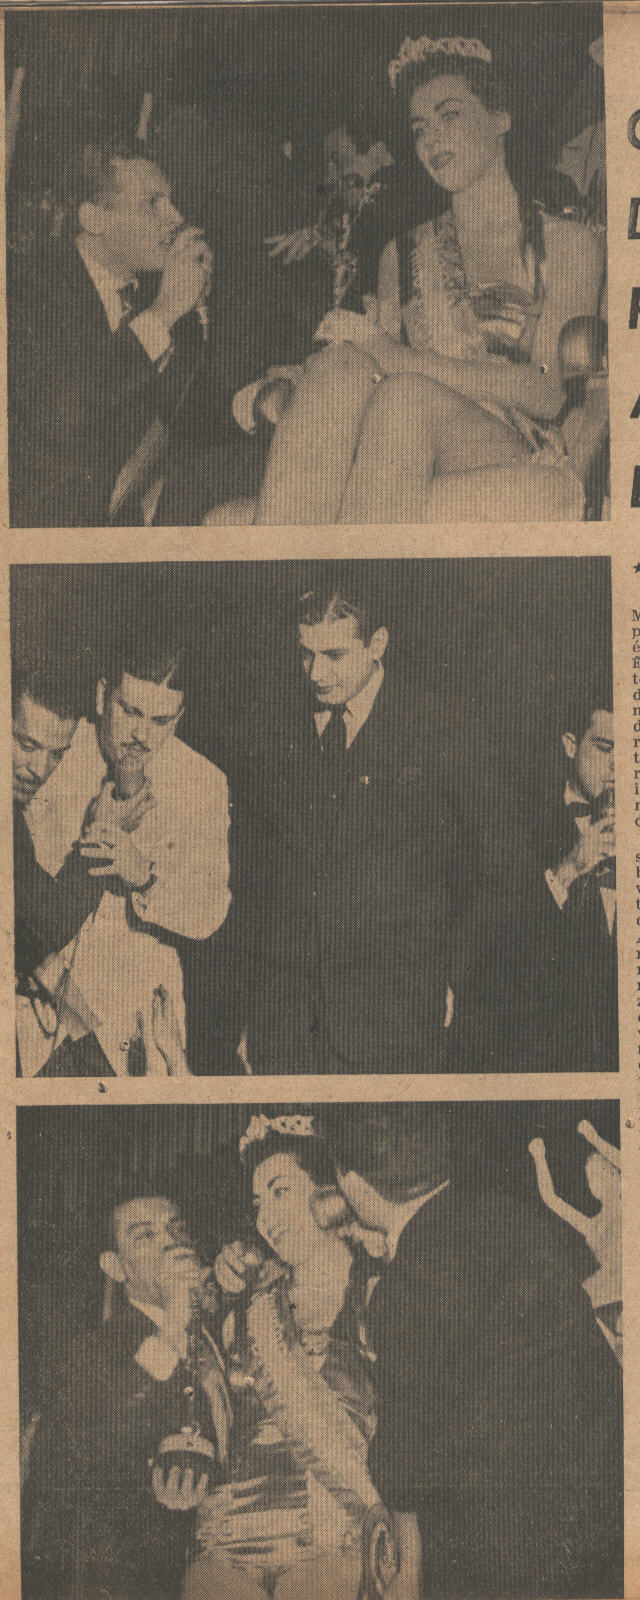 maria jose cardoso, semifinalista de miss universe 1956. Miss-n11